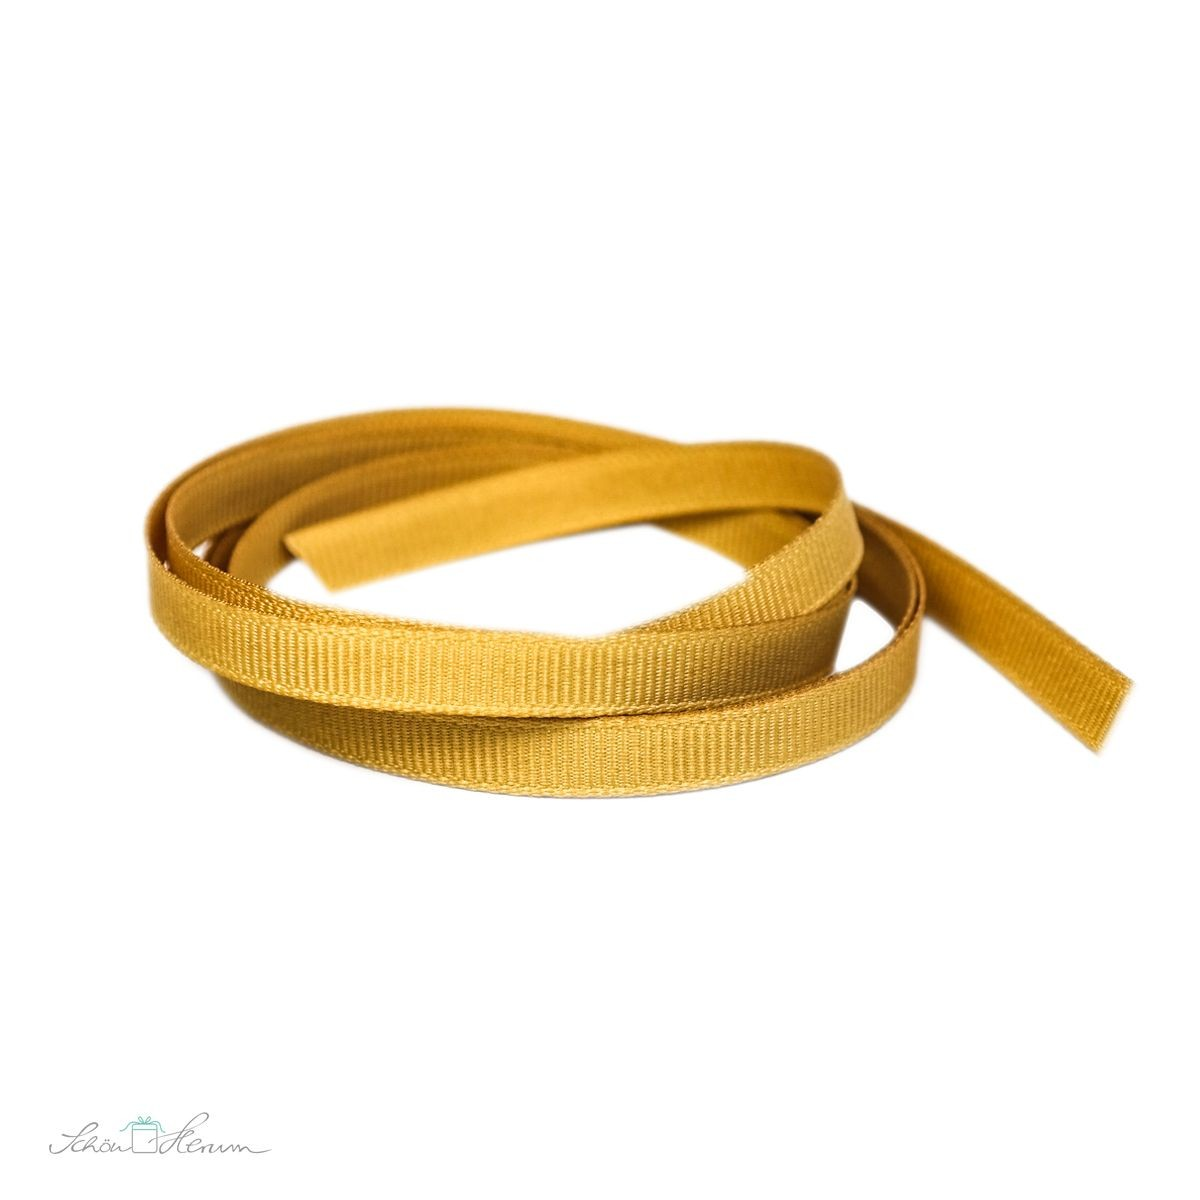 ripsband gold 6 mm breit 2 m. Black Bedroom Furniture Sets. Home Design Ideas